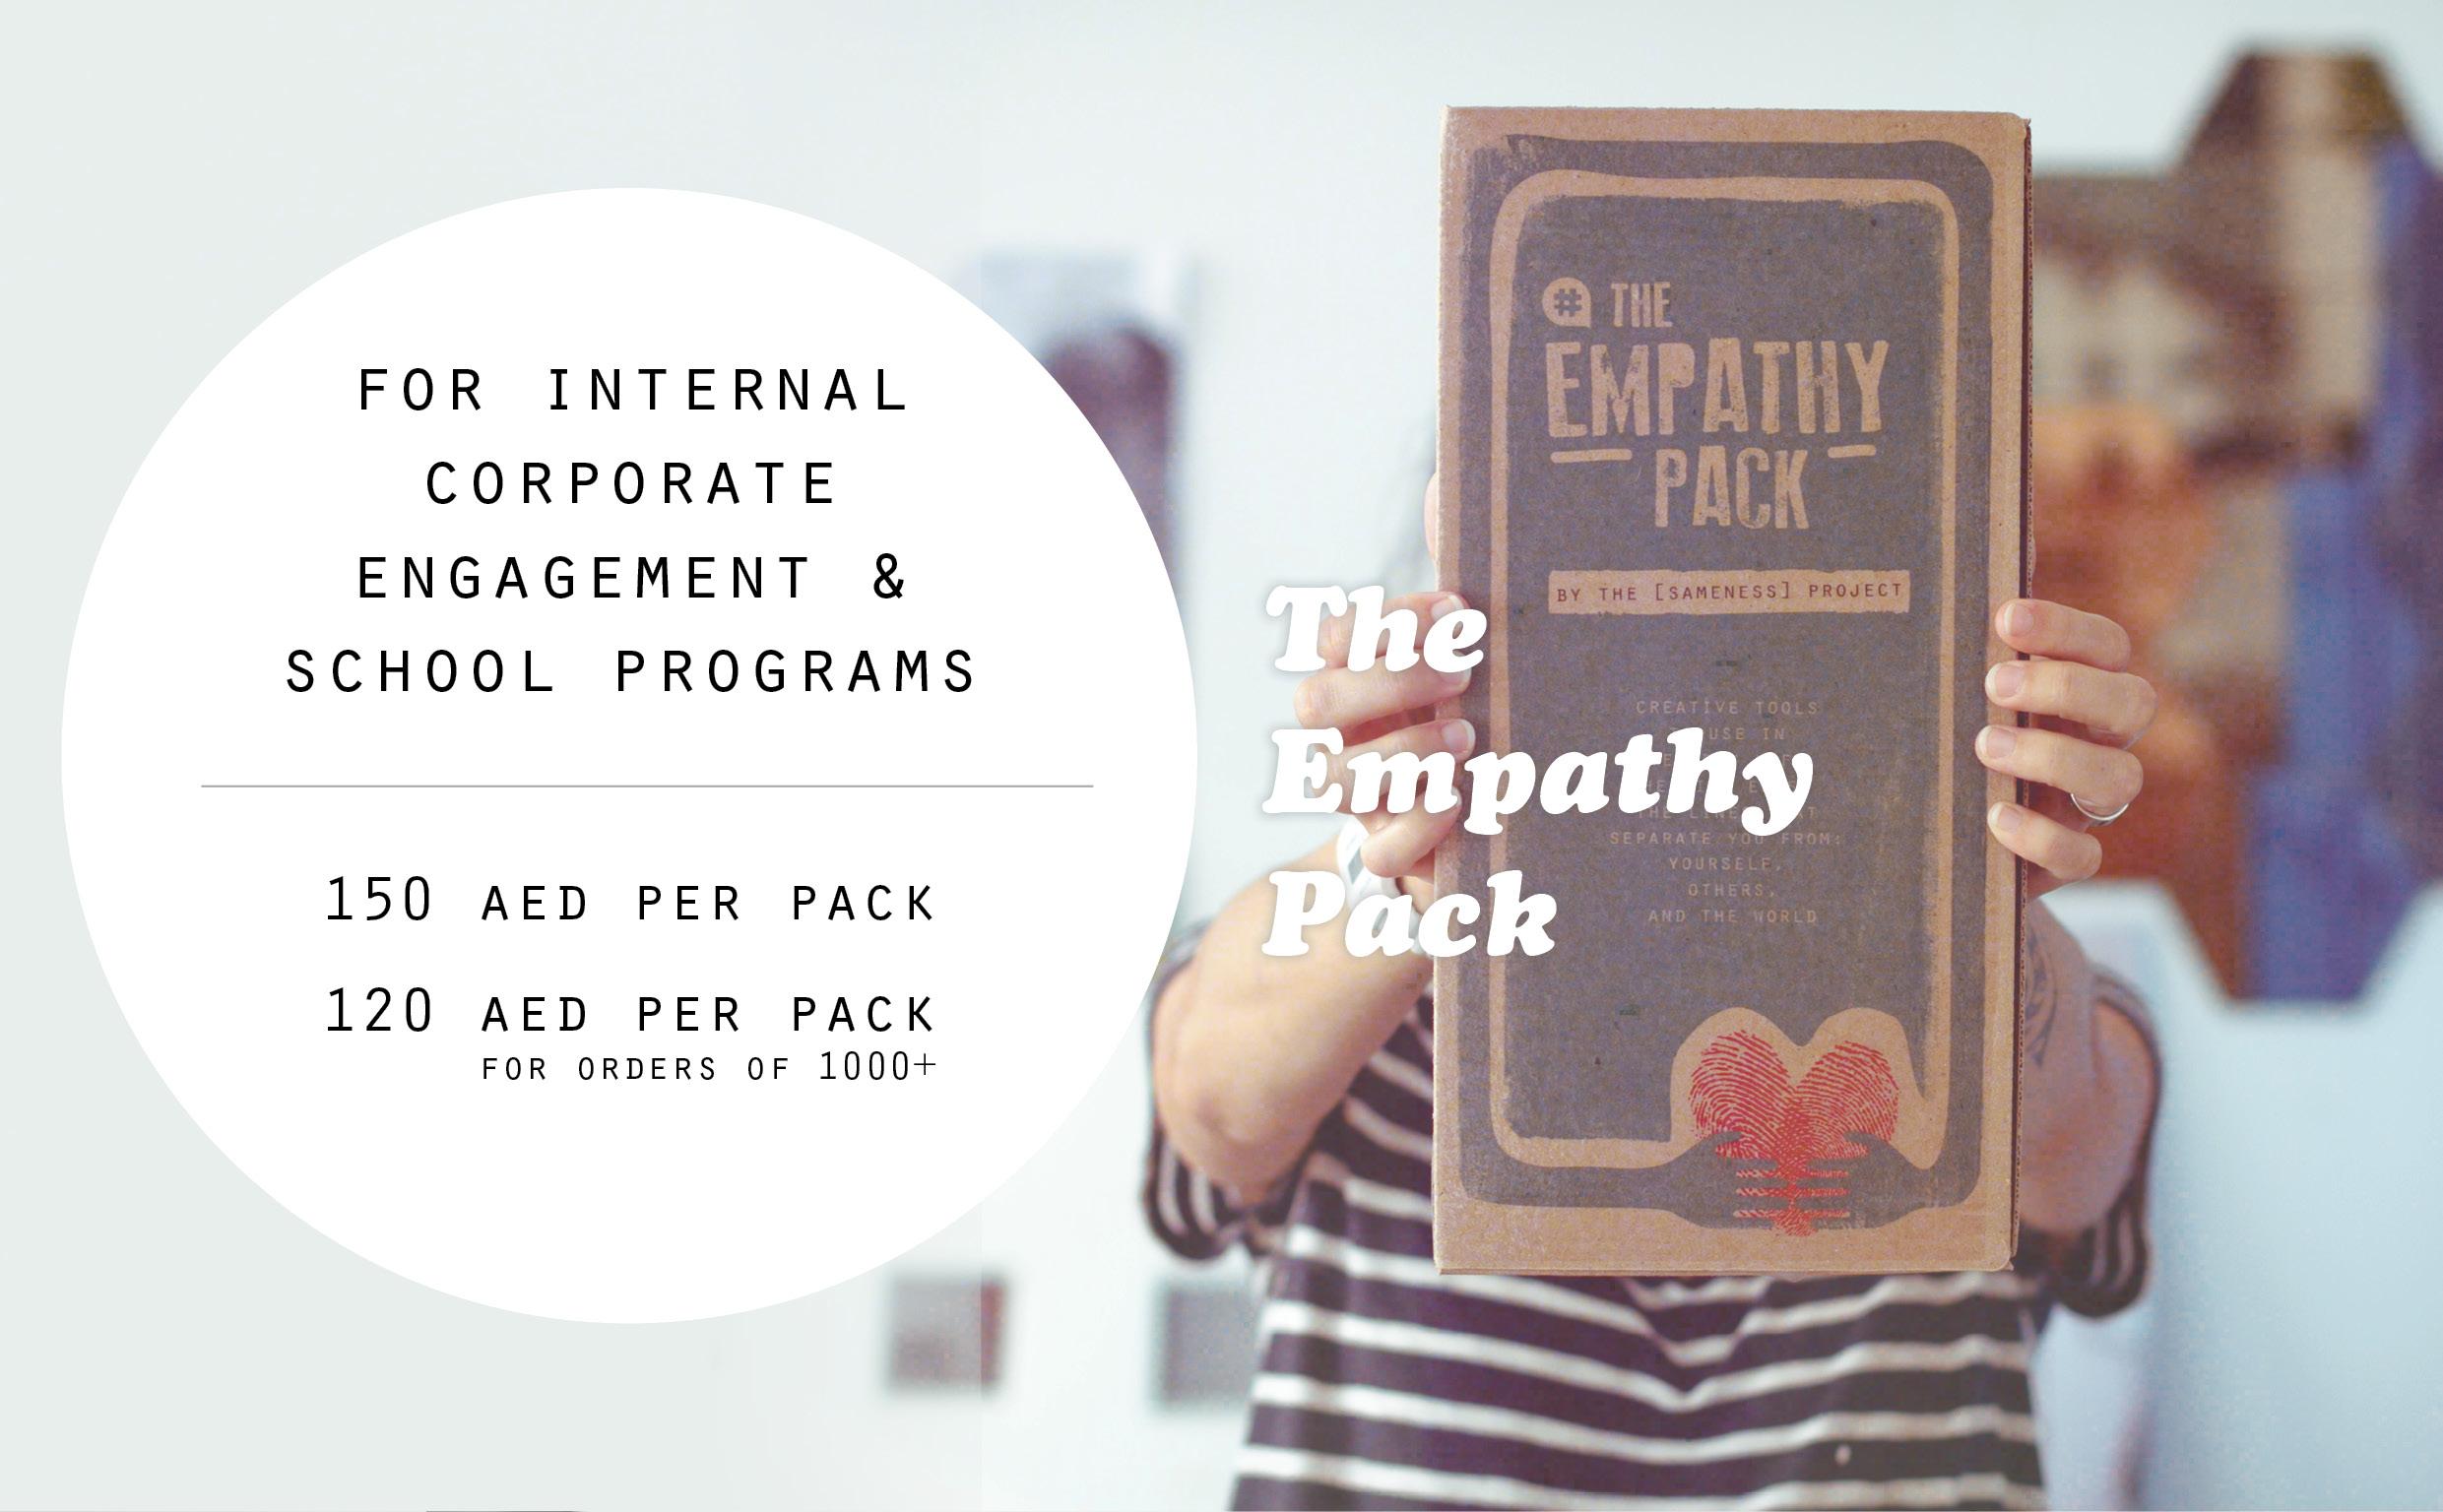 Empathy Pack 1